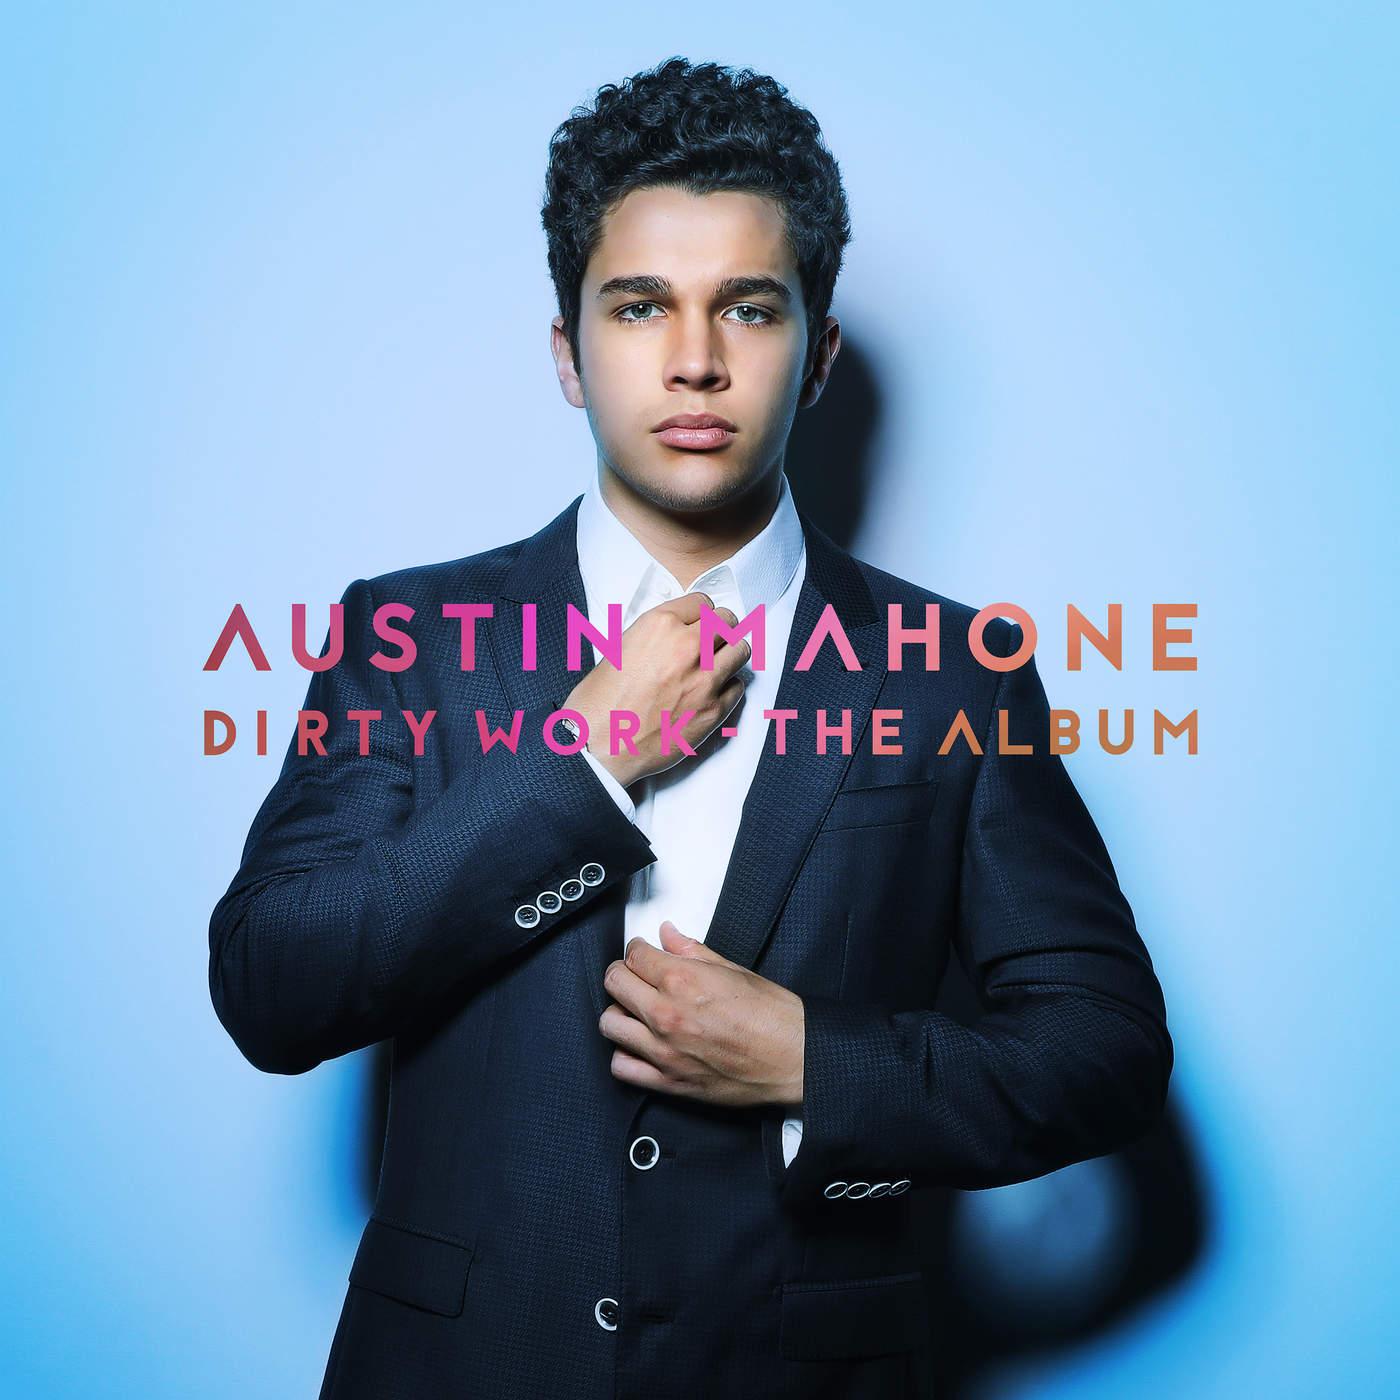 Austin Mahone - Dirty Work - The Album